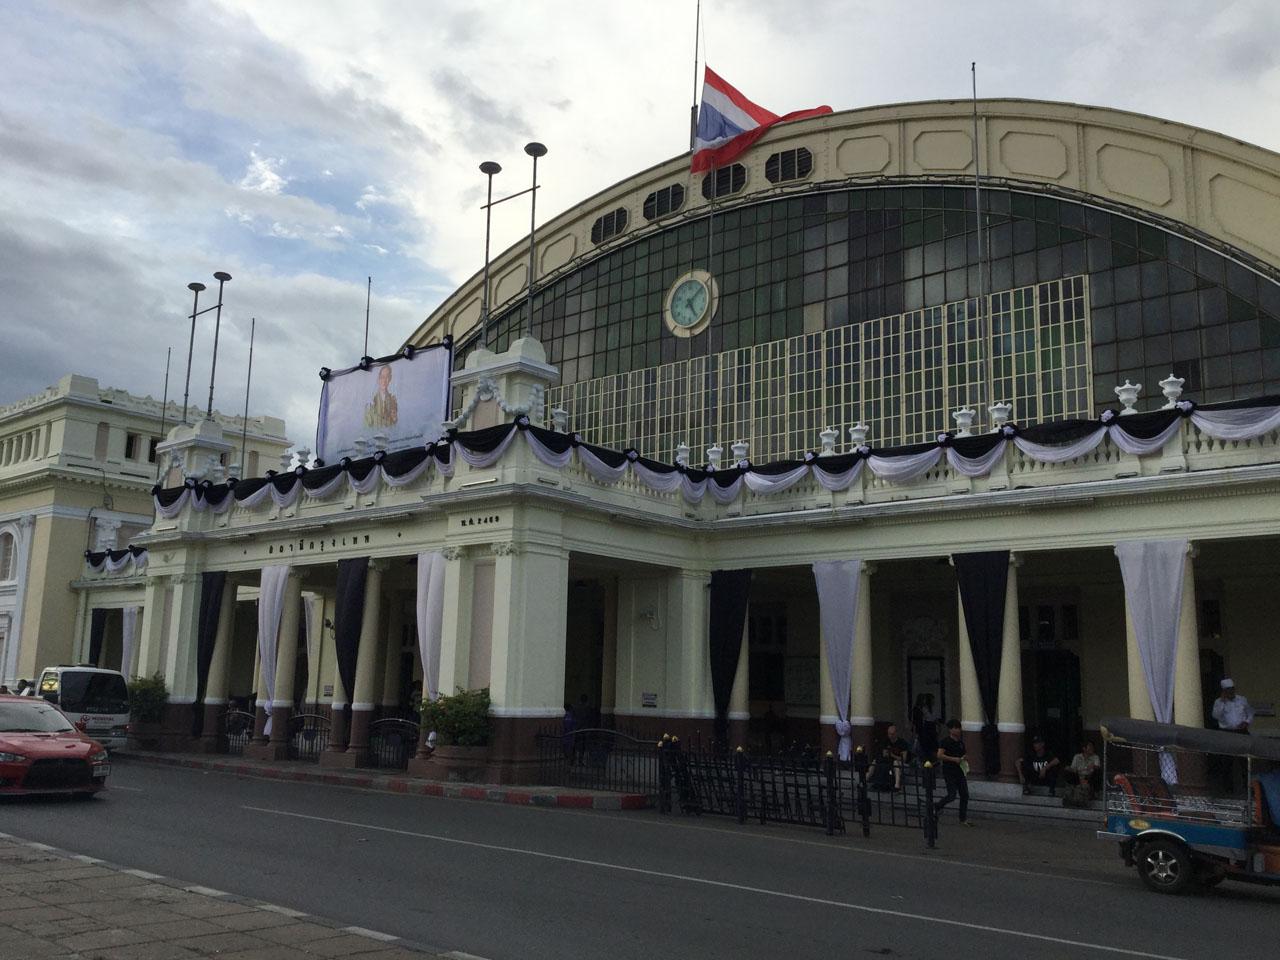 Hua Lamphong Bangkok Railway Station